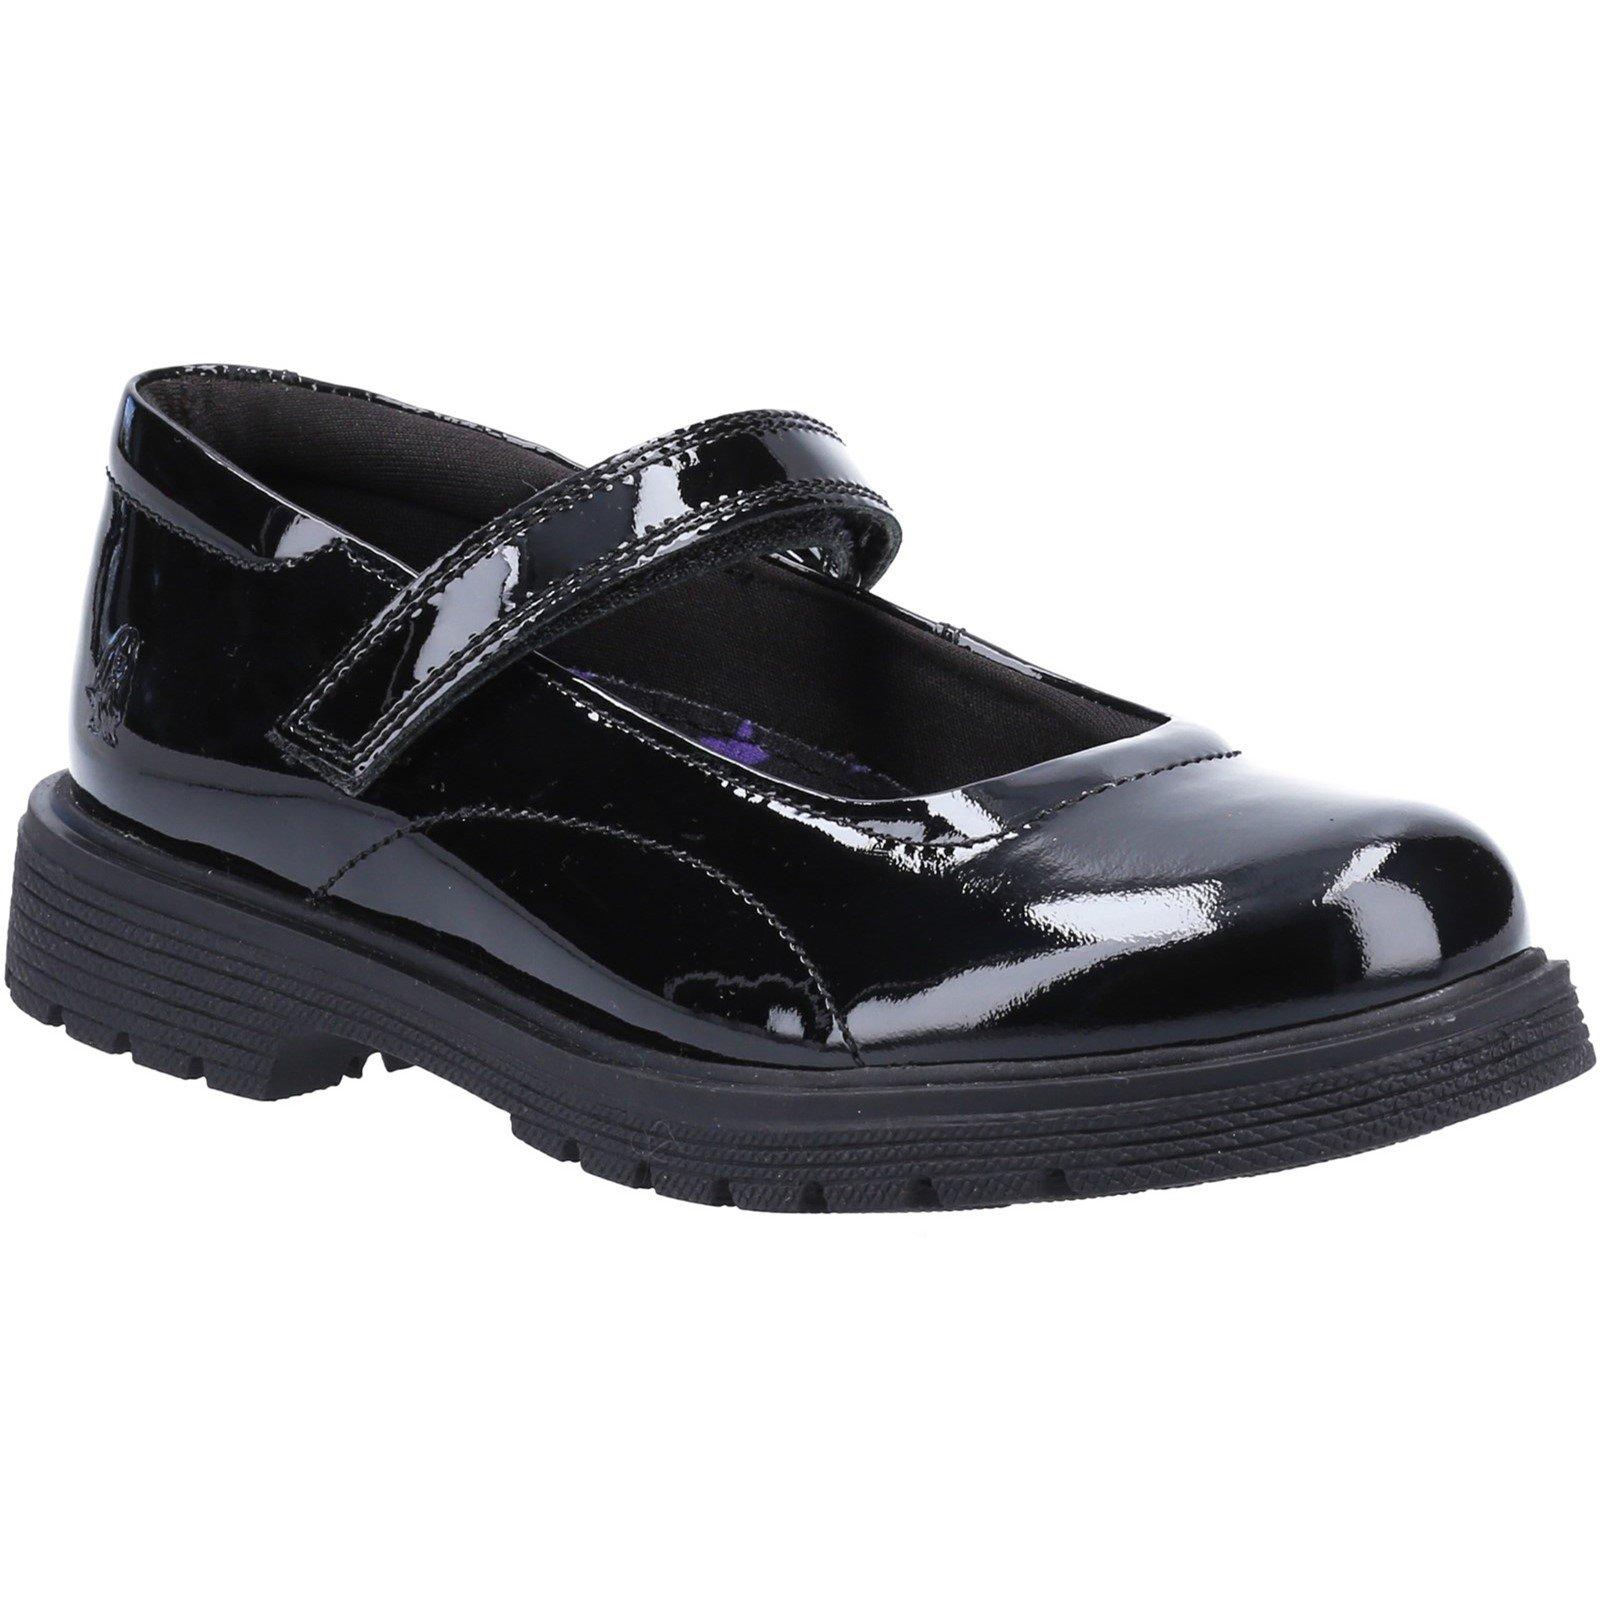 Hush Puppies Kid's Tally Junior School Shoe Patent Black 32814 - Patent Black 13